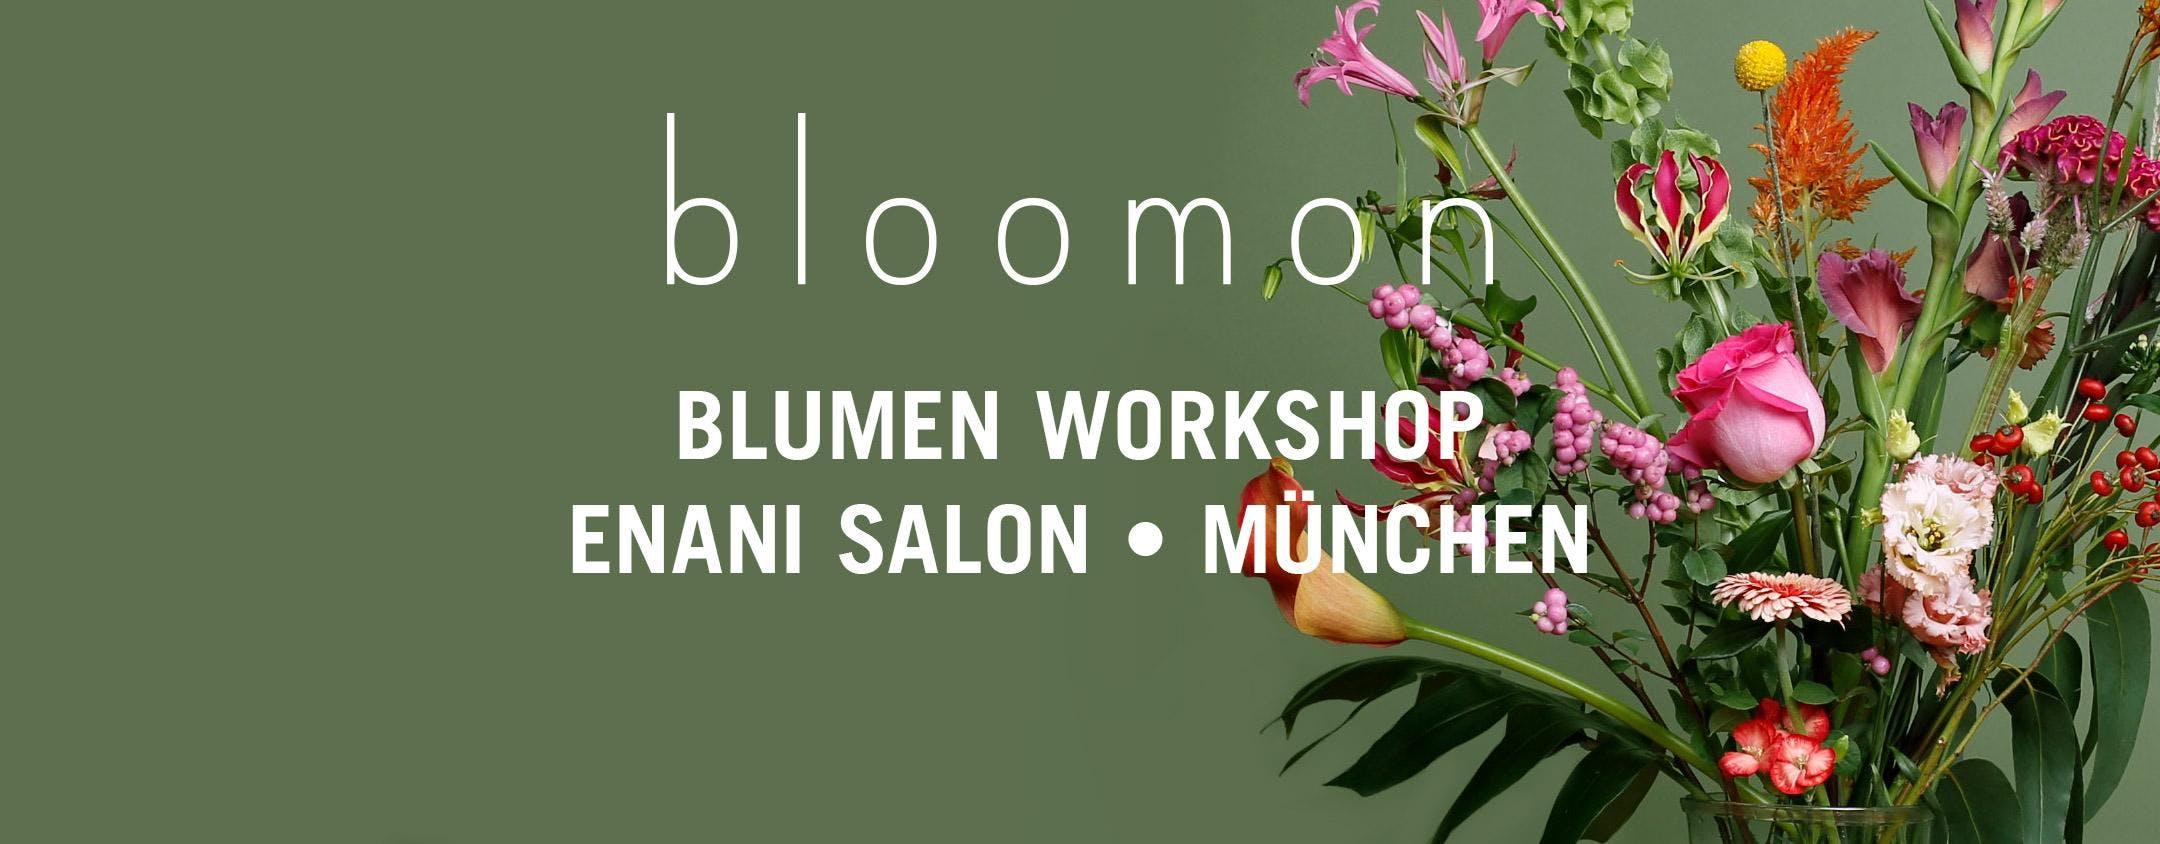 bloomon Workshop 02. Februar   München, Enani